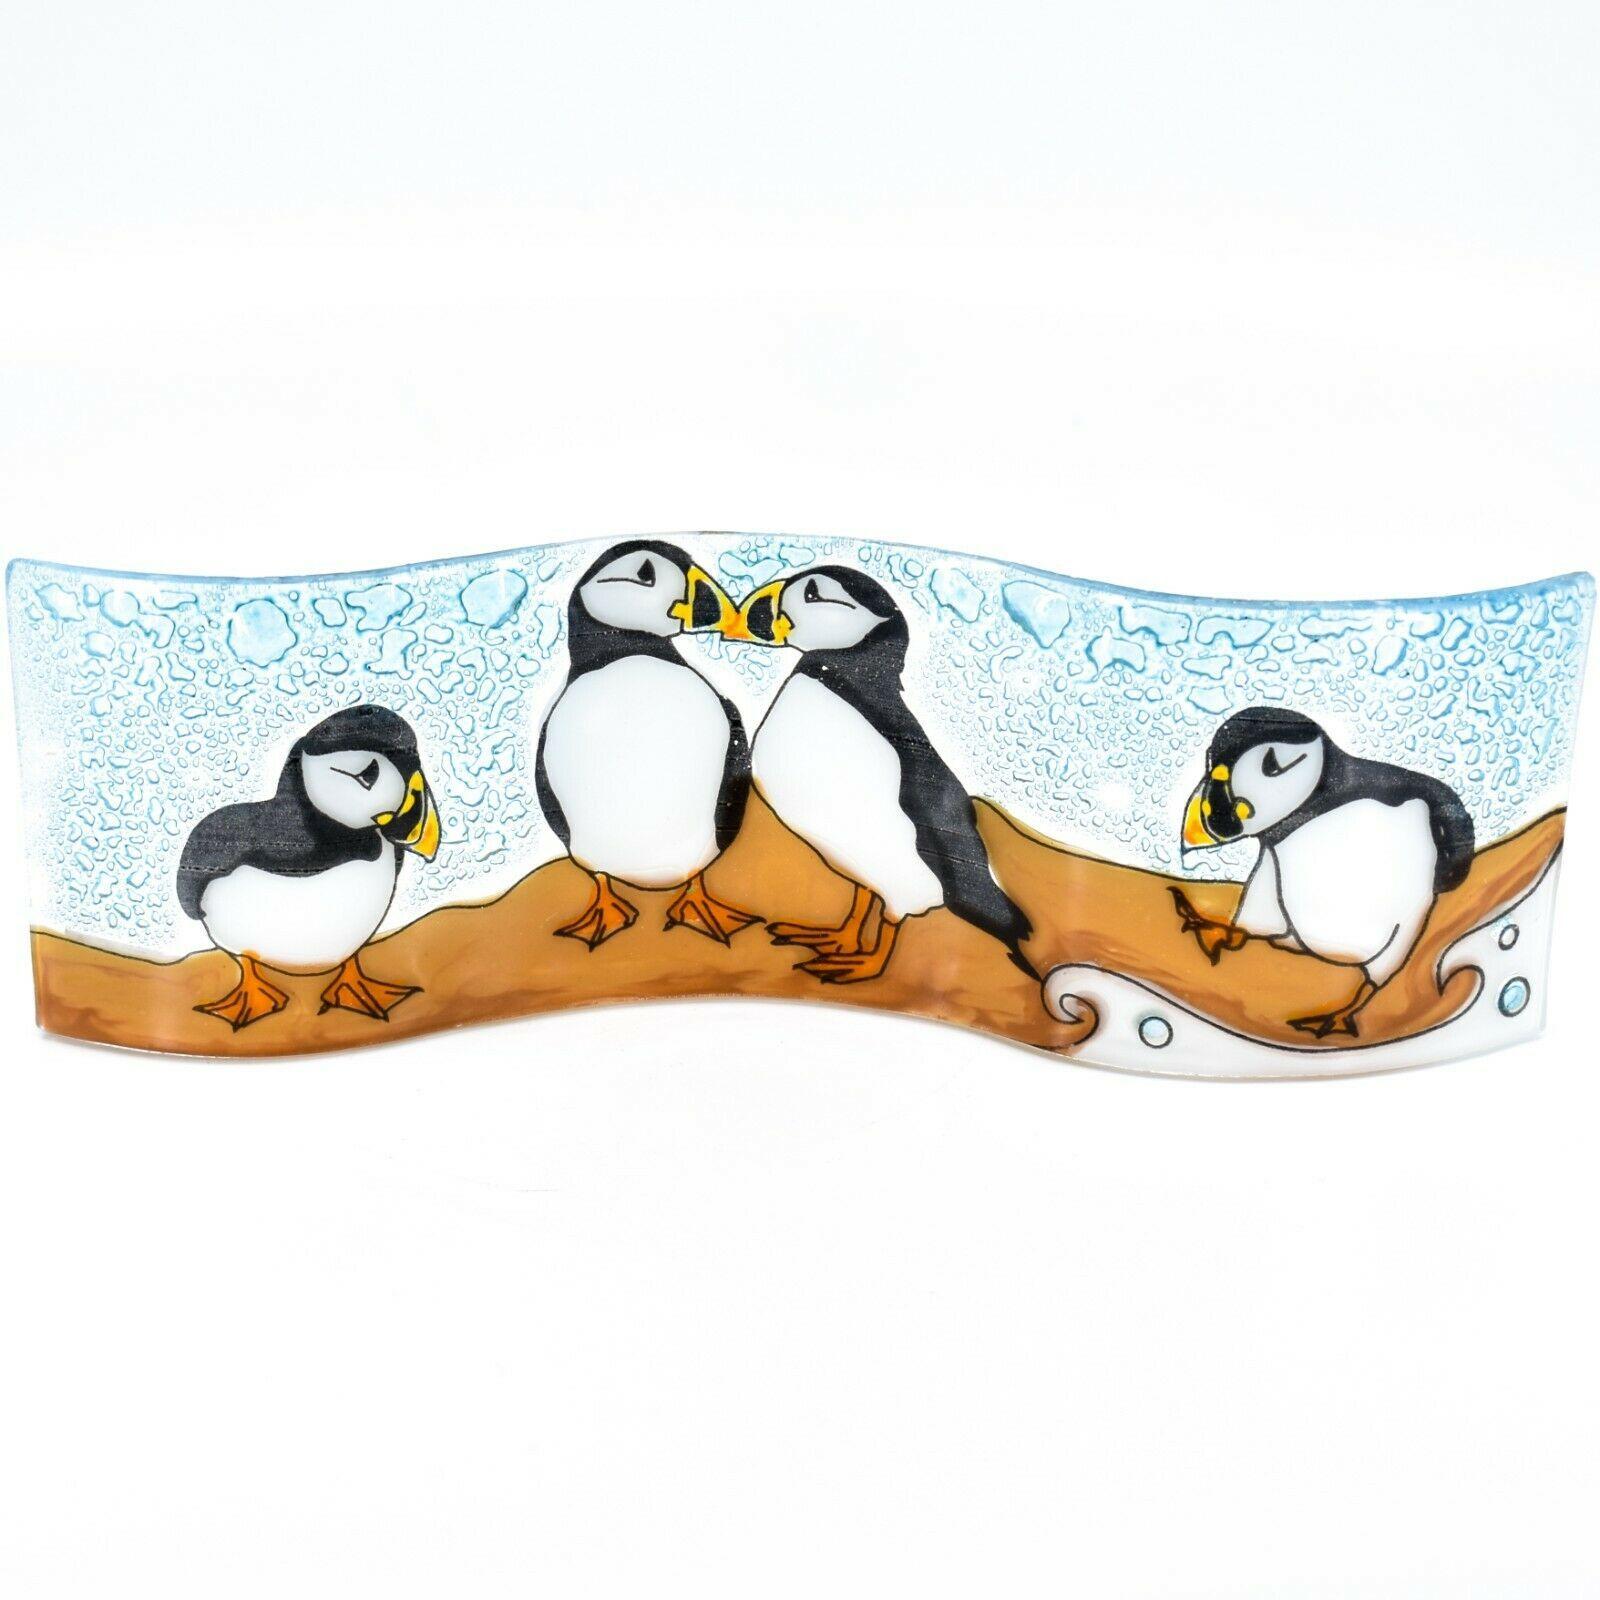 Fused Art Glass Puffin Birds Wavy Suncatcher Sun Catcher Handmade in Ecuador